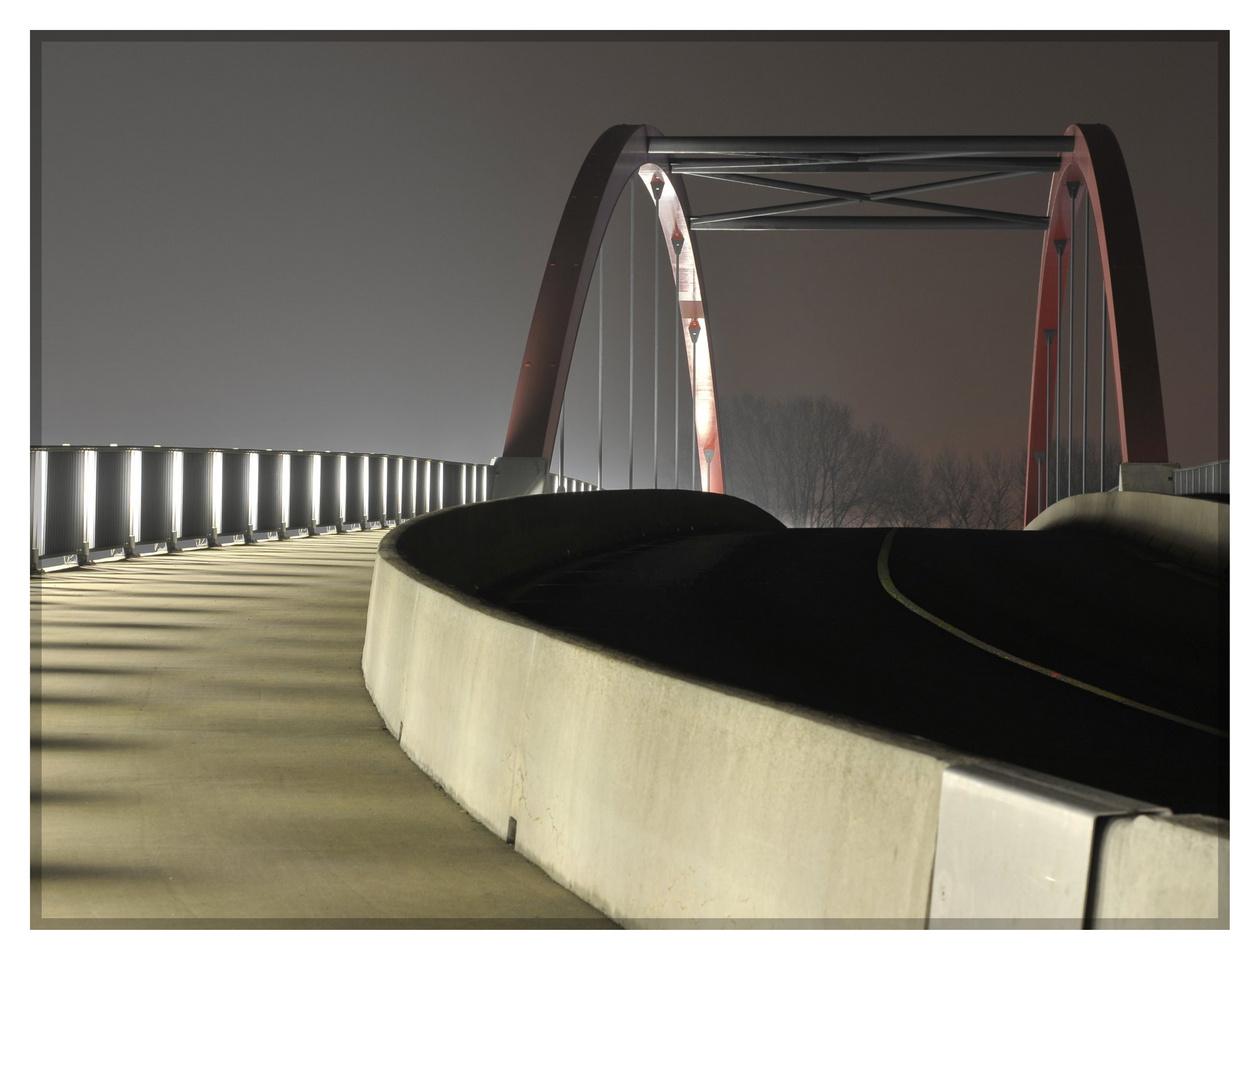 Brückengang